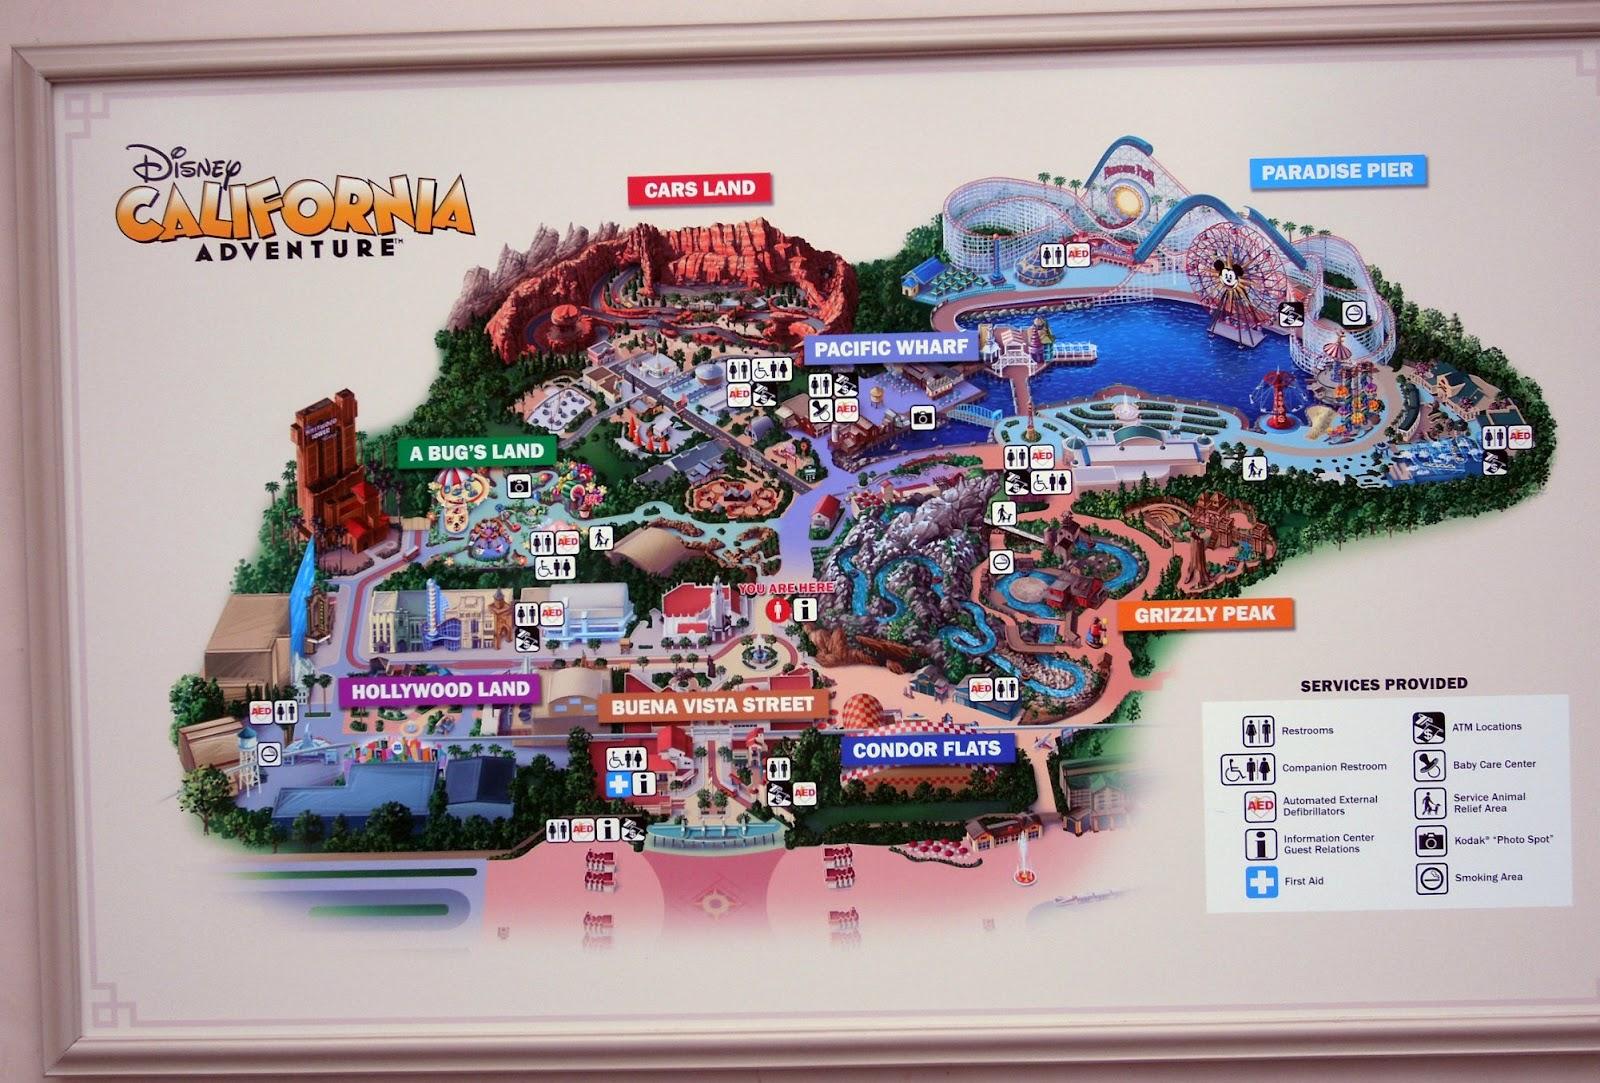 CuterMousecom A CuterMouse View Of Disney New Disney California - Disneyland usa location map